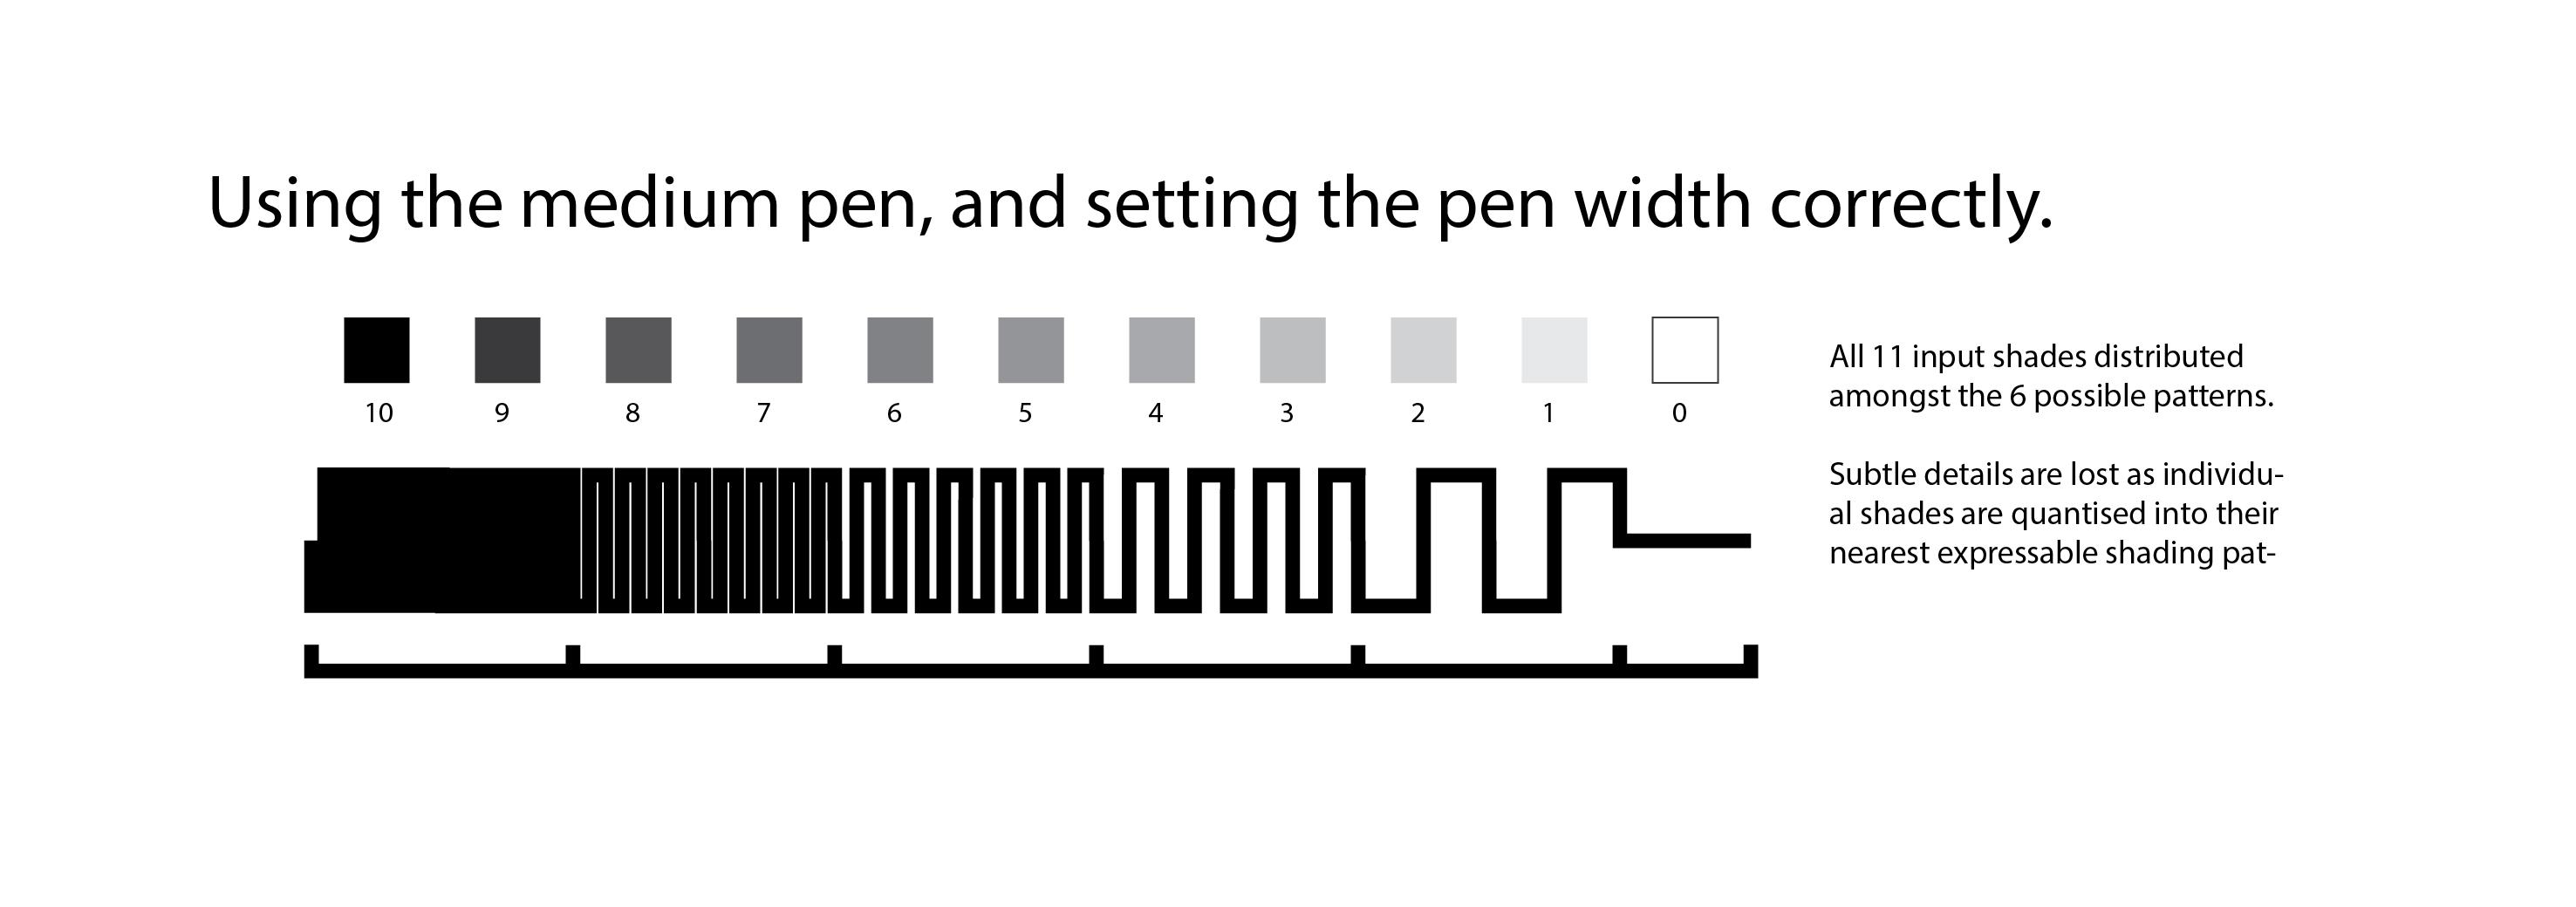 Pixel explanation - medium pen